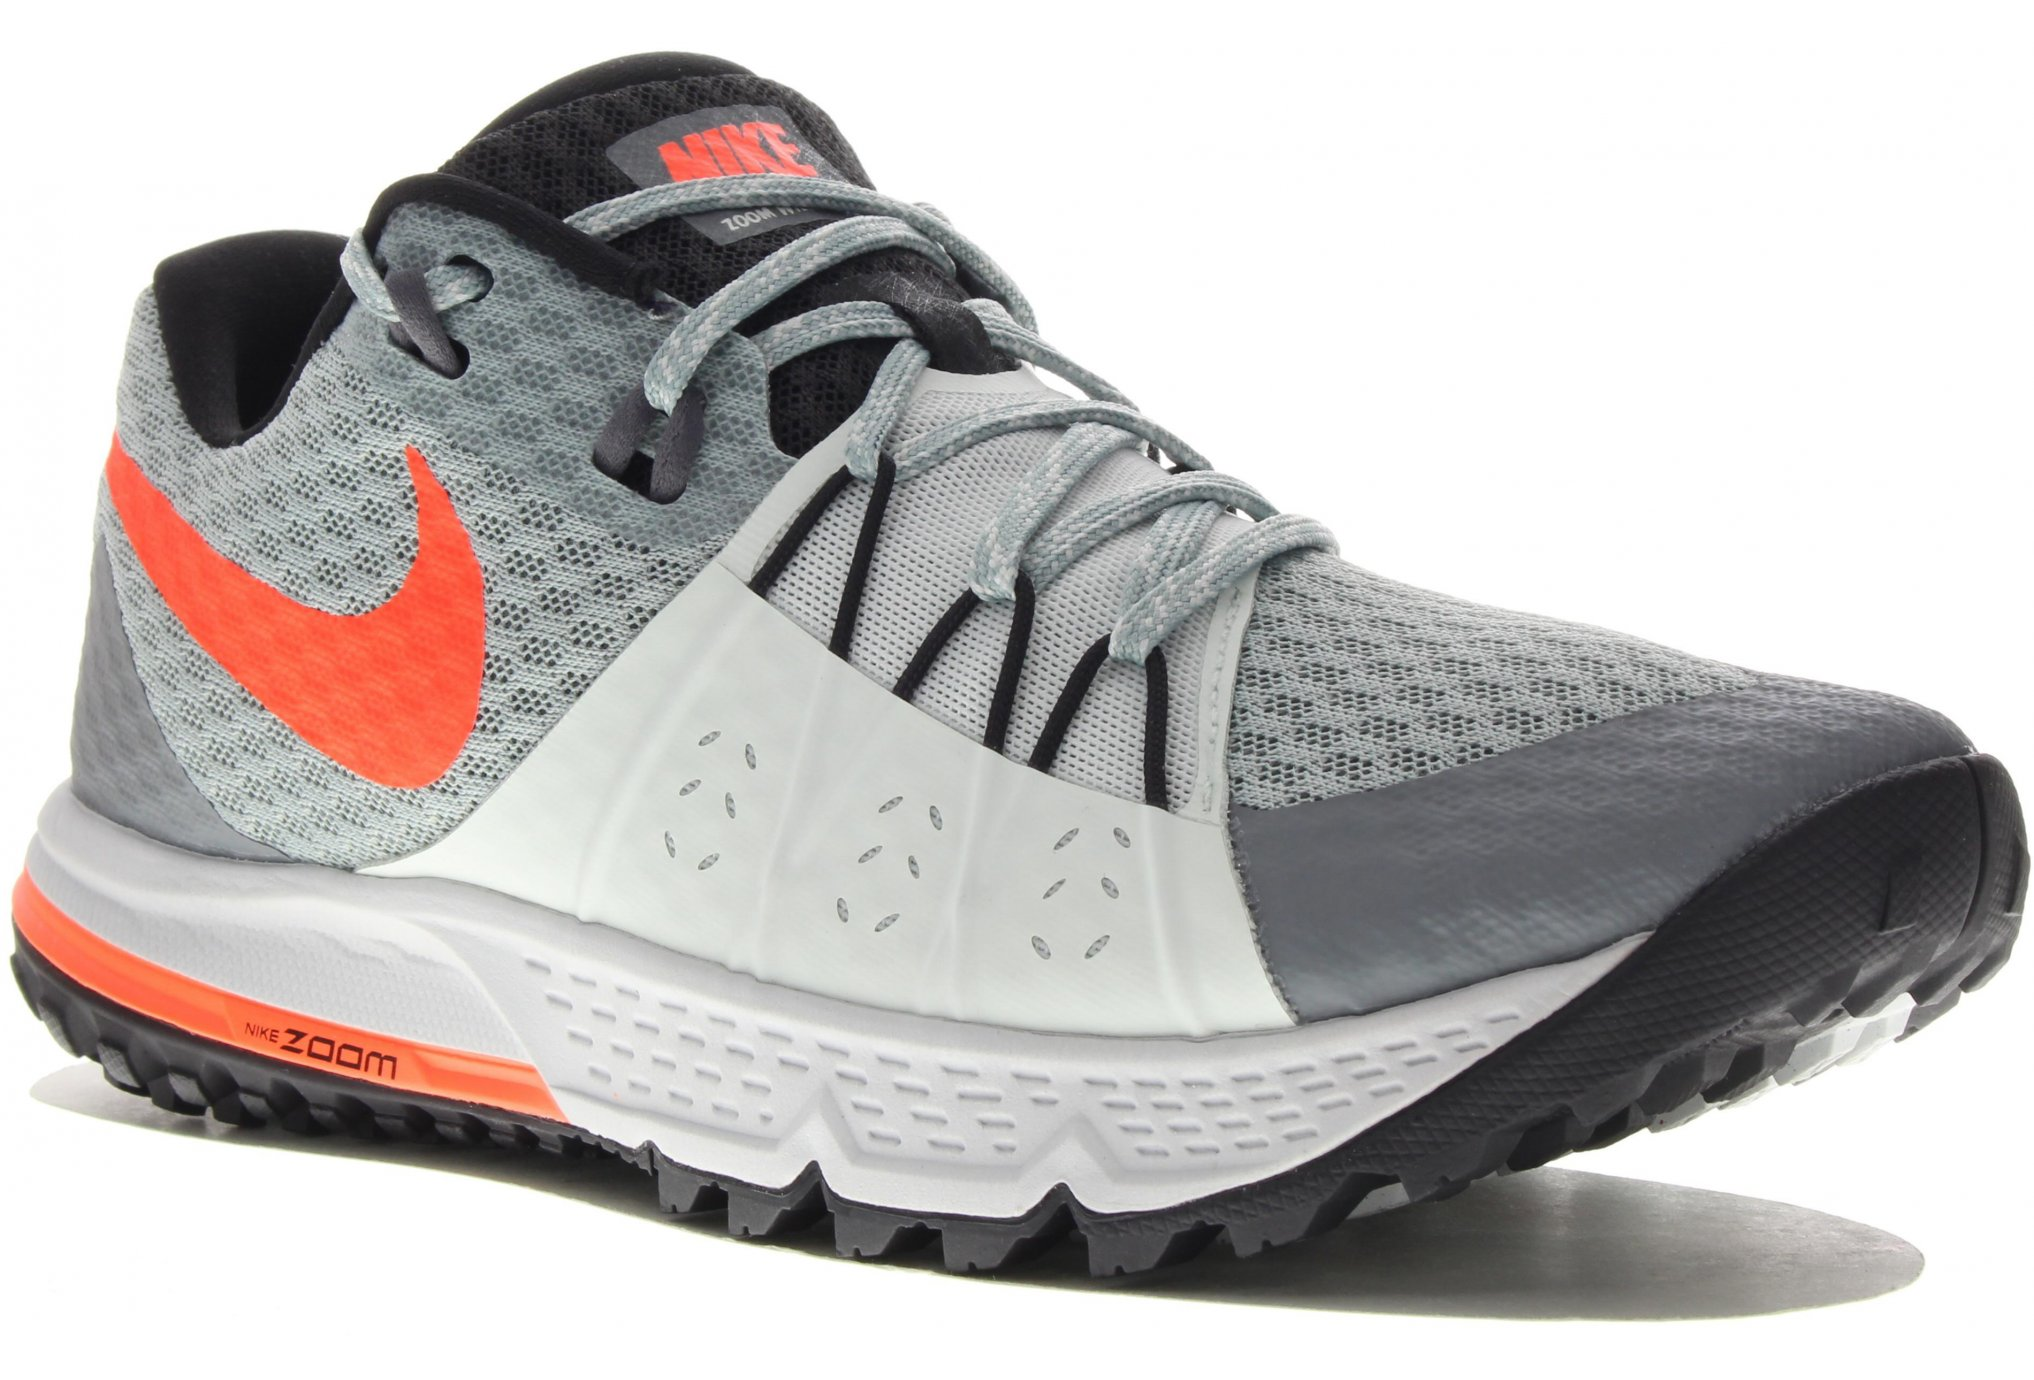 Nike Air Zoom Wildhorse 4 W Diététique Chaussures femme